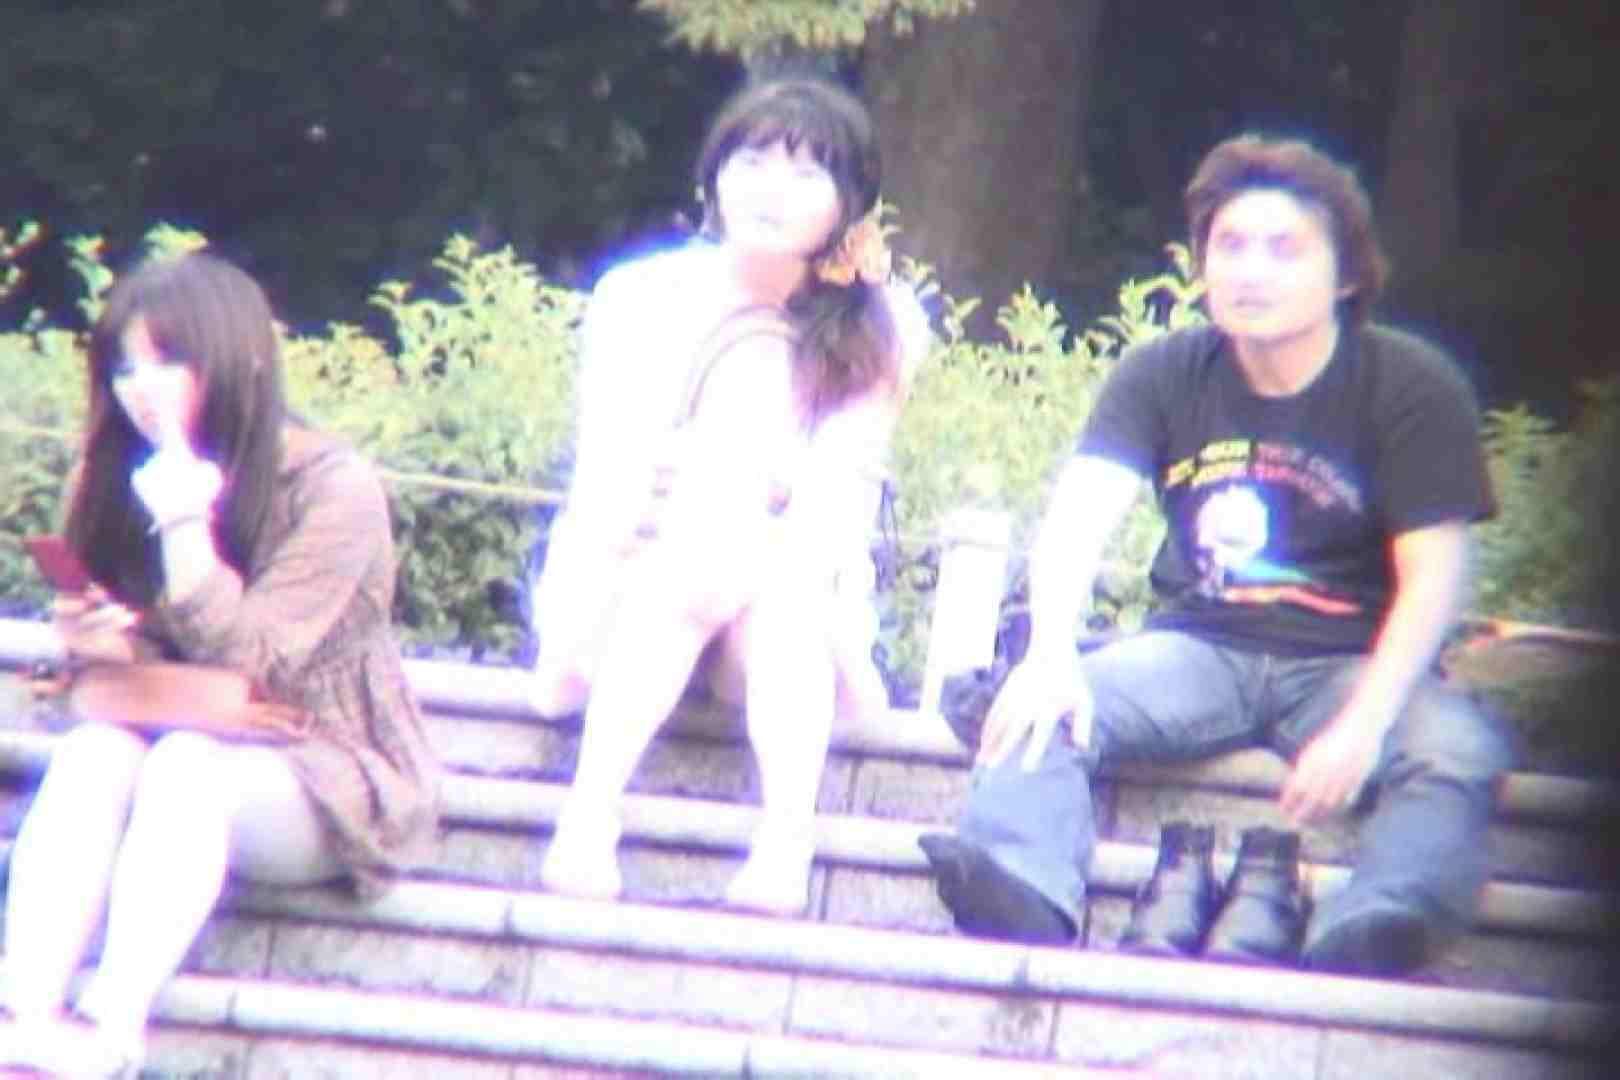 超最新版!春夏秋冬 vol.04 現役ギャル  97pic 66